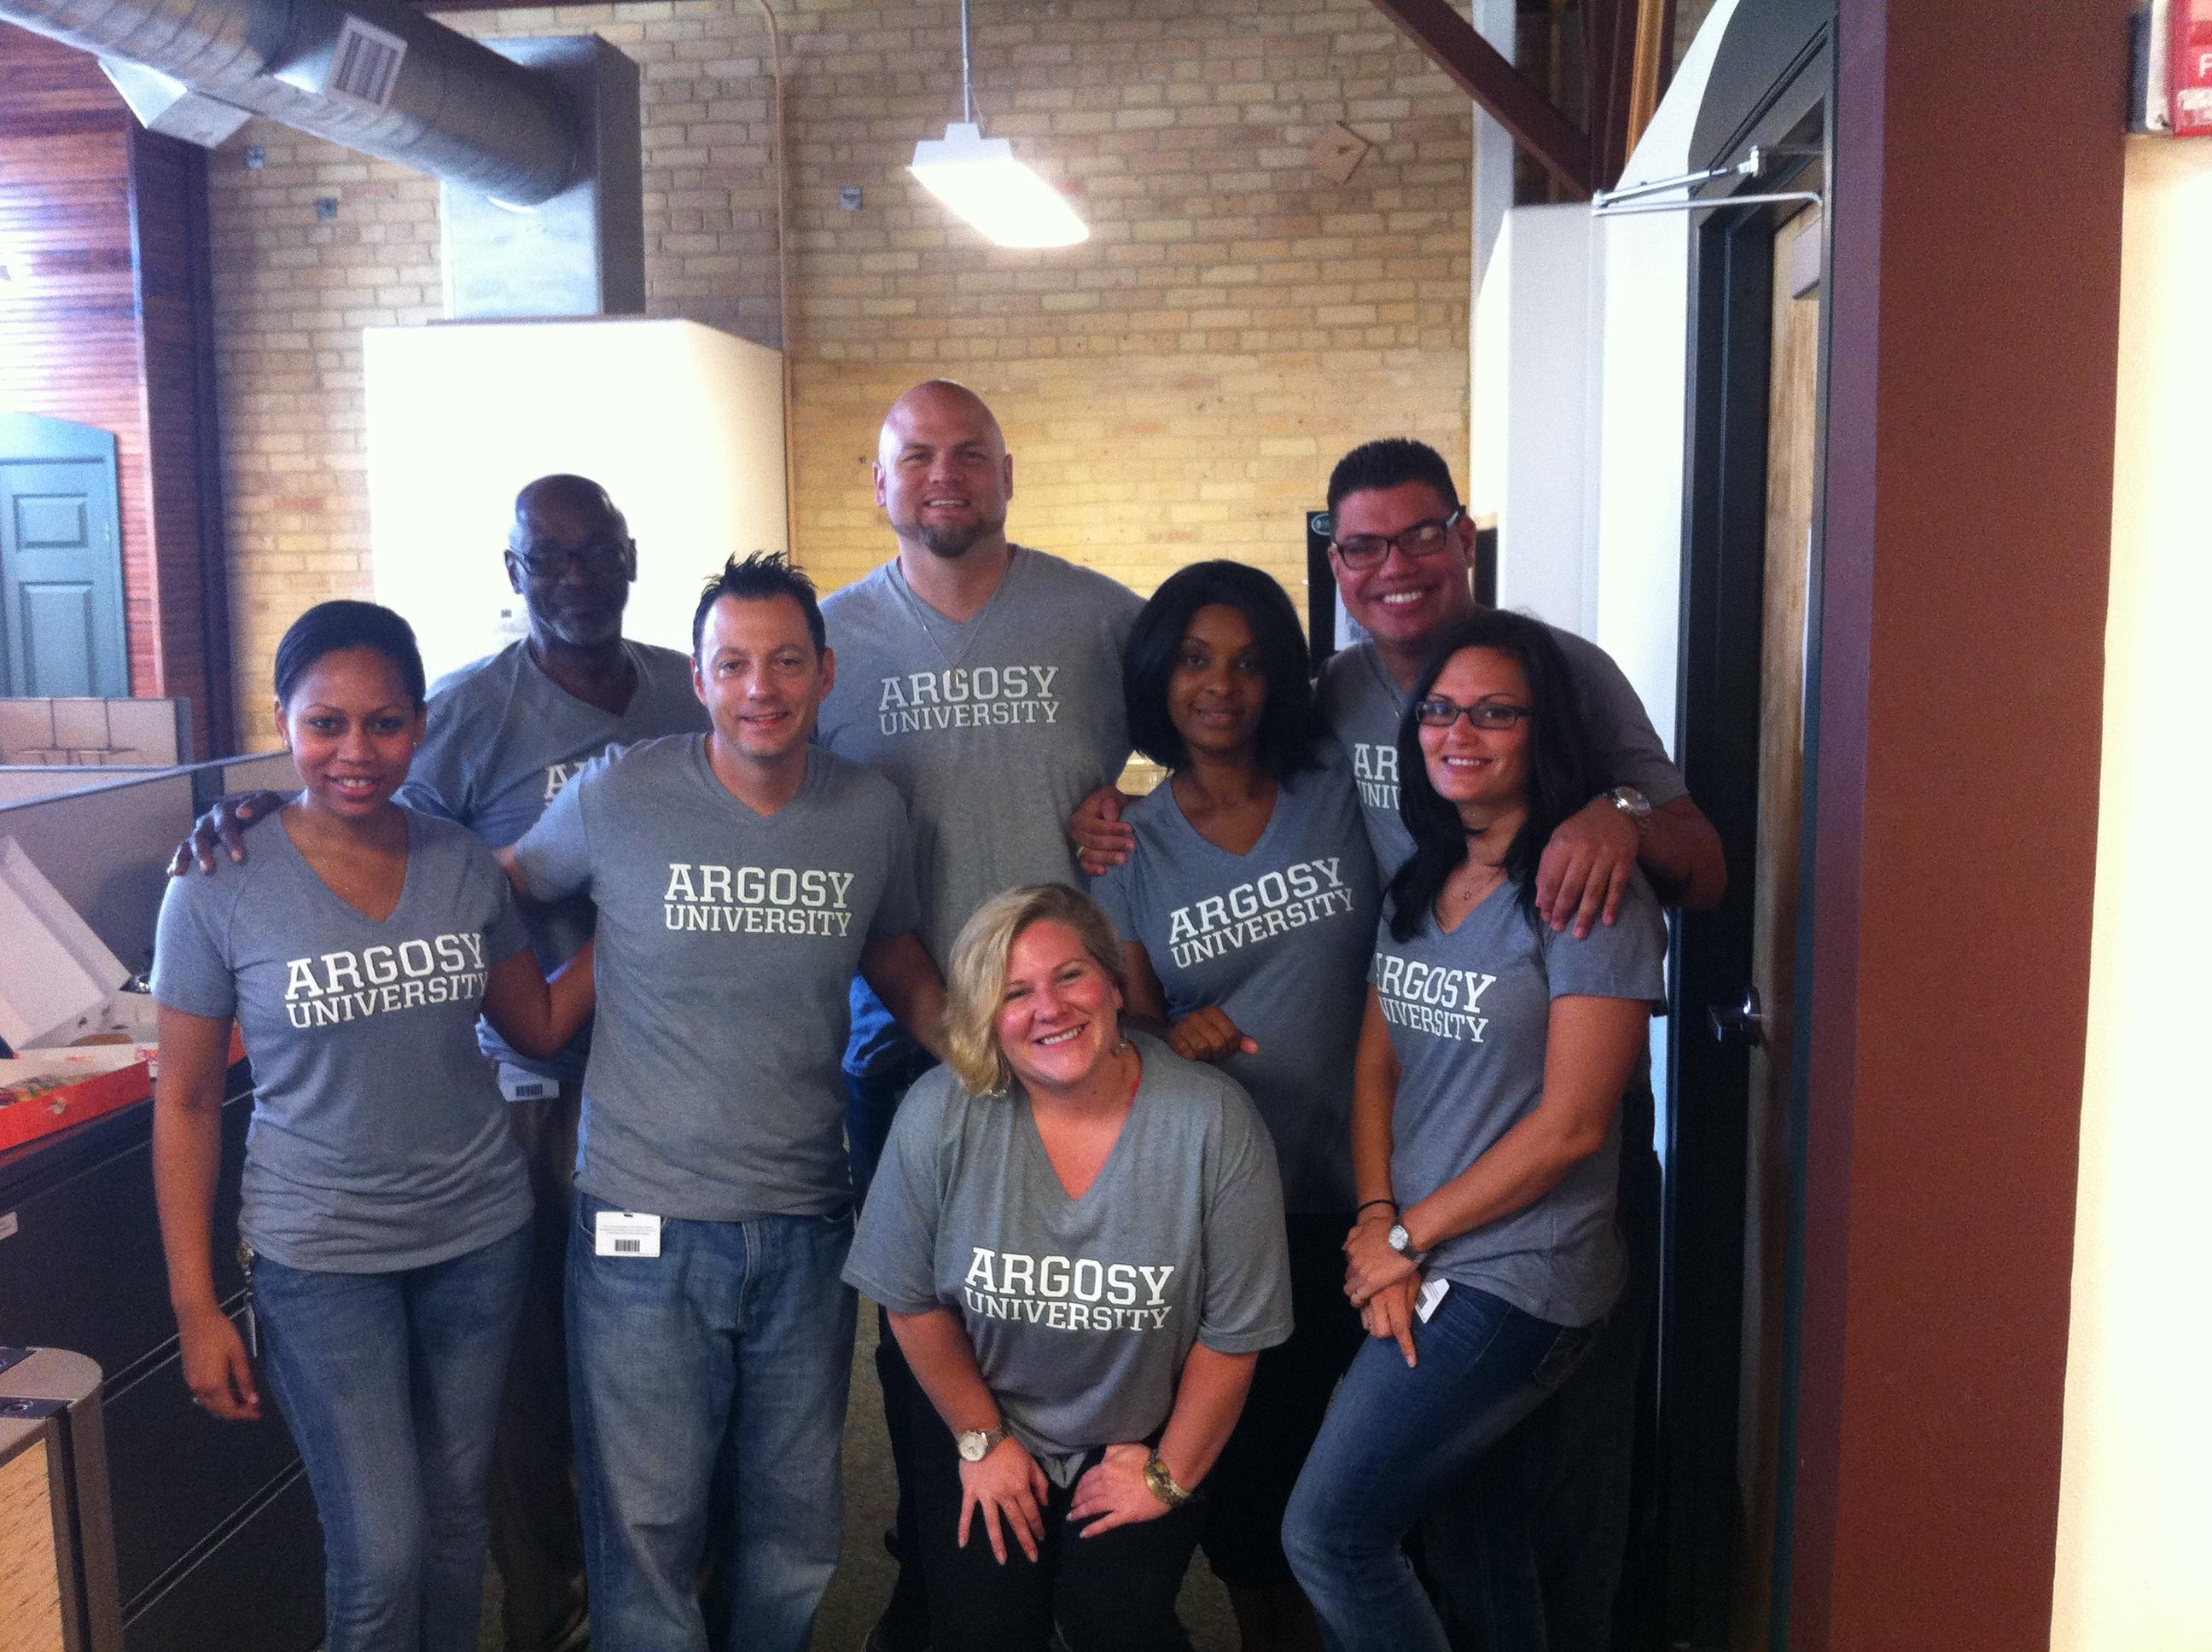 Shirt design tampa - Argosy University Tampa T Shirt Photo